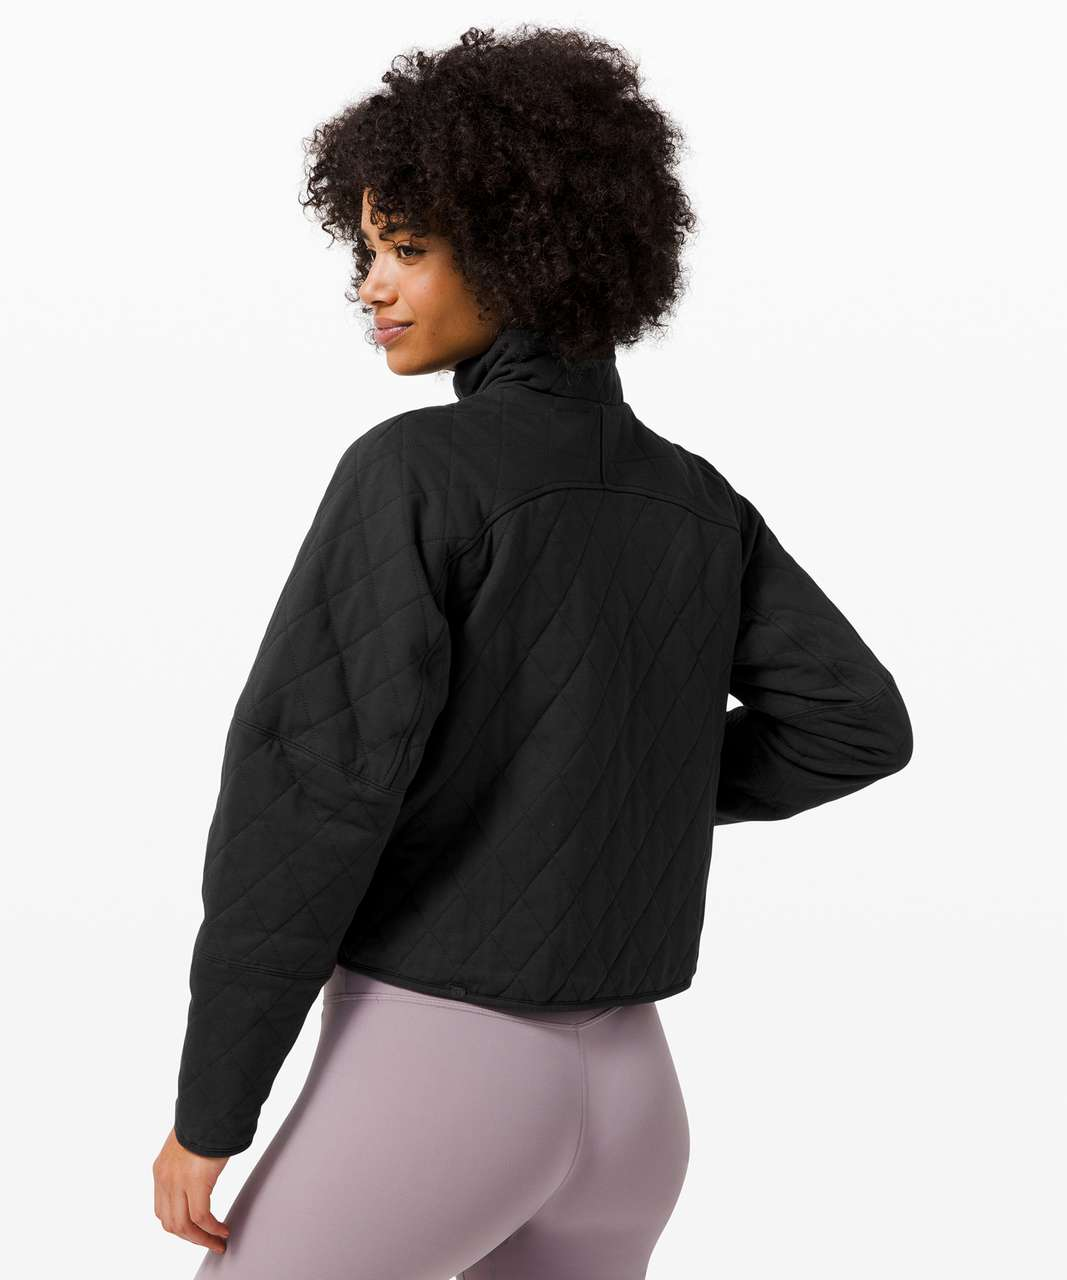 Lululemon Quilted Calm Jacket - Black